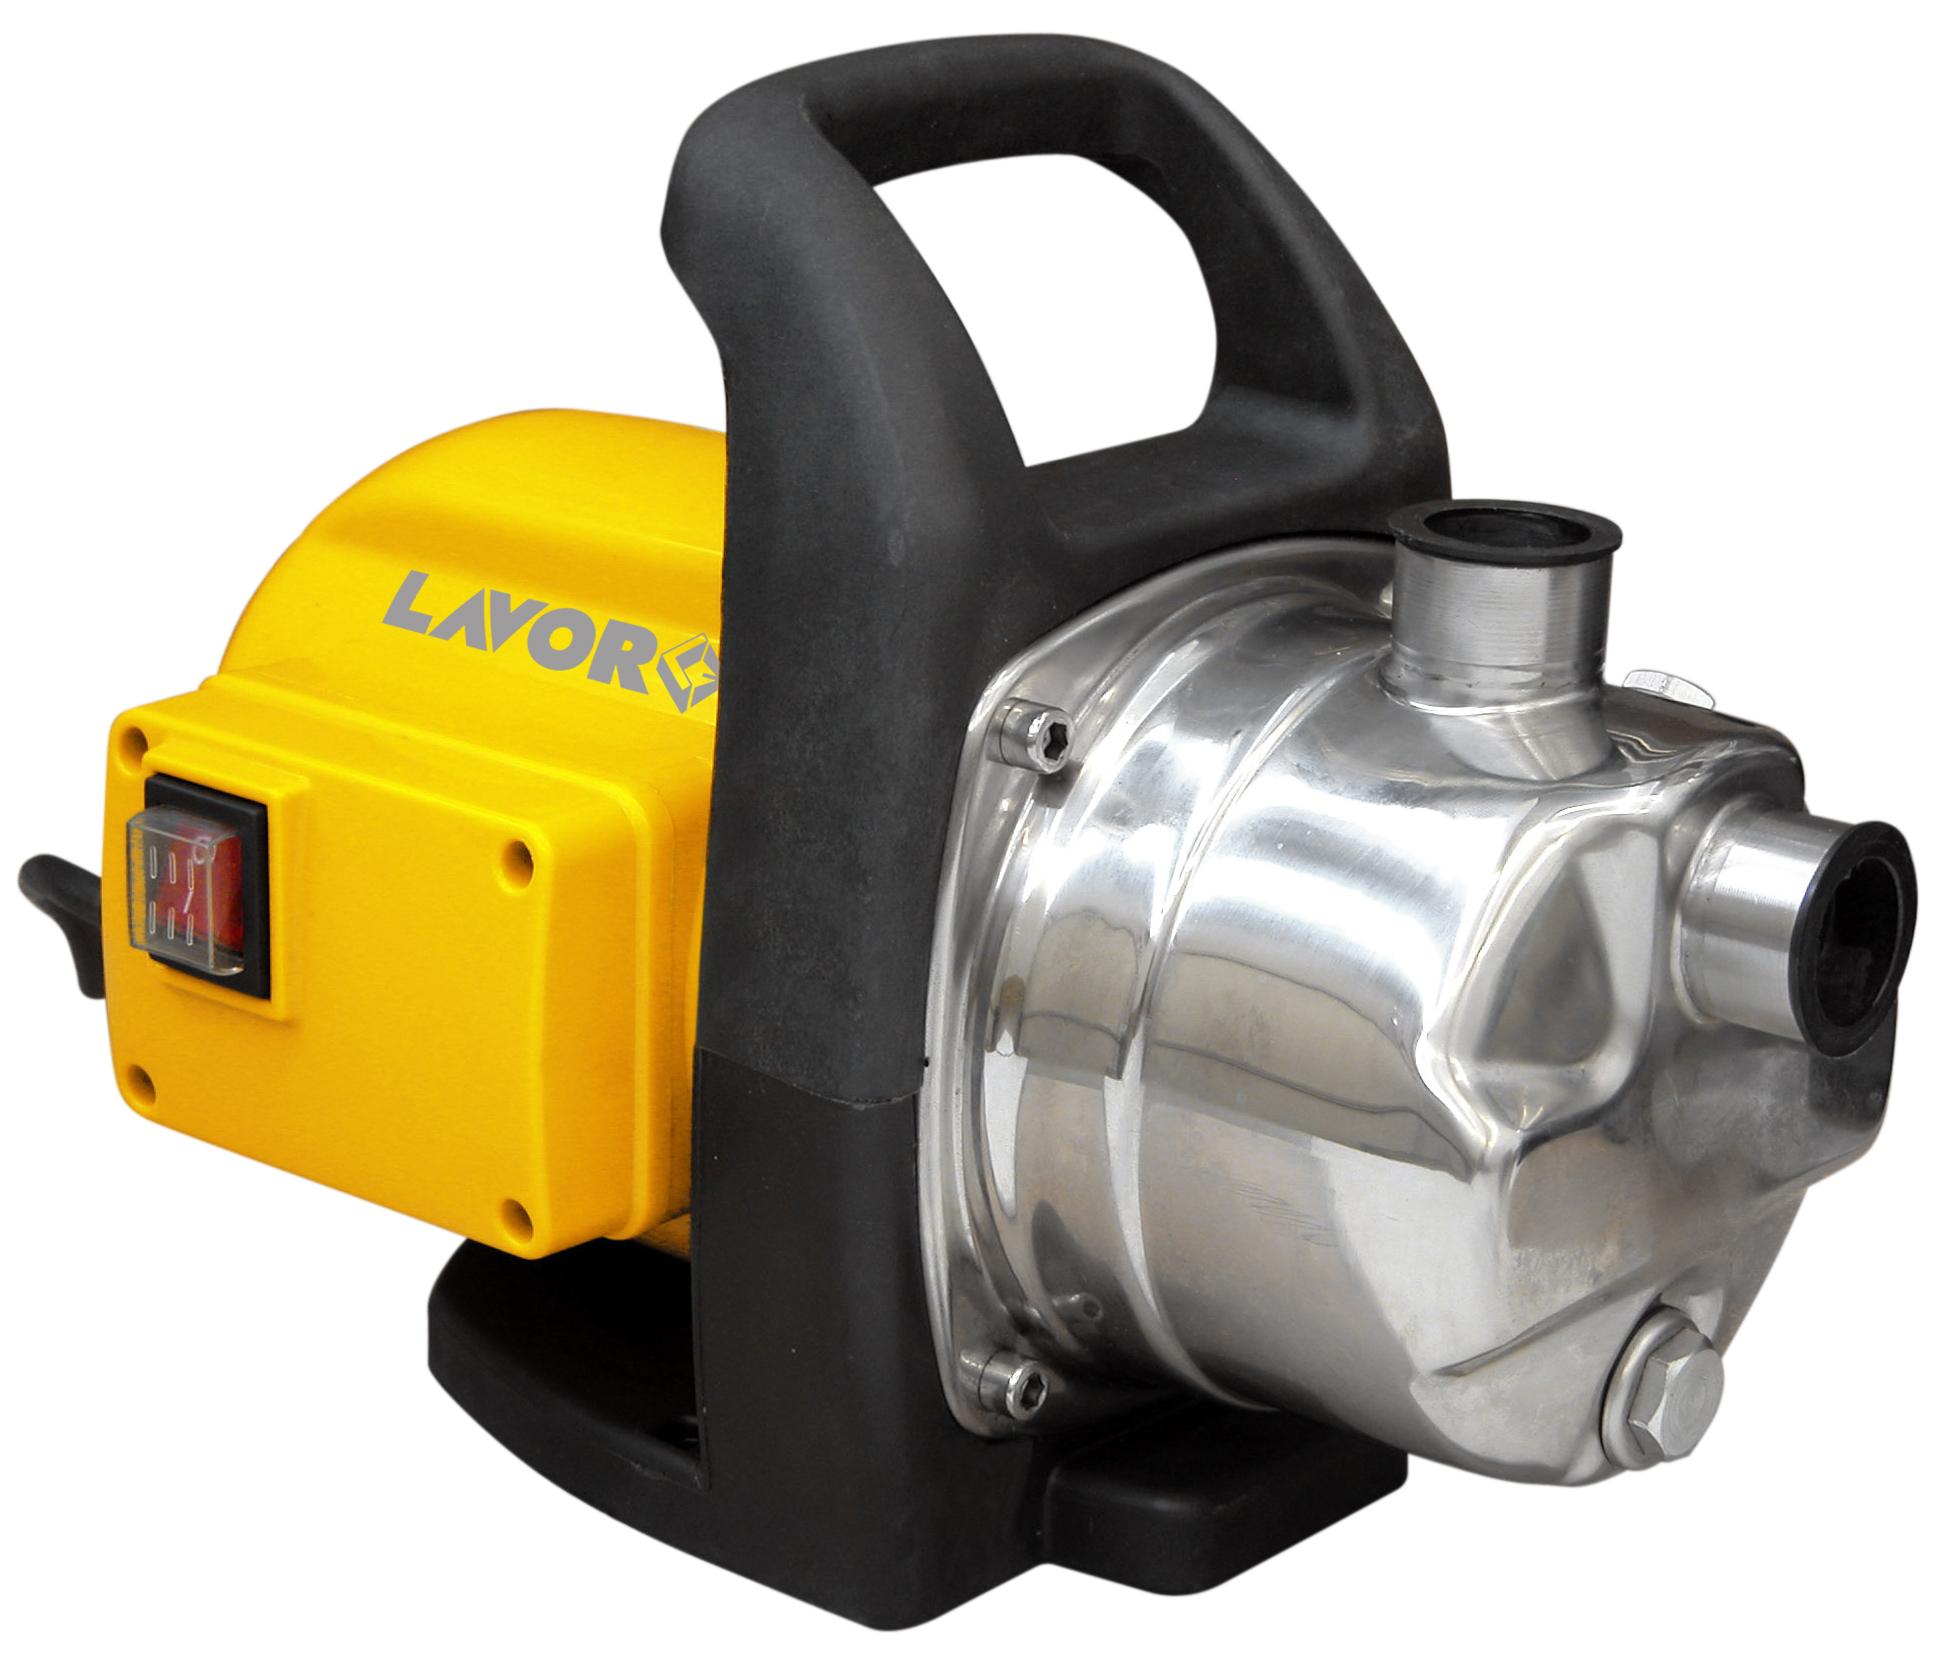 LAVOR Gartenpumpe Teichpumpe Regenwasser Bewässerung Pumpe EG-M 3800